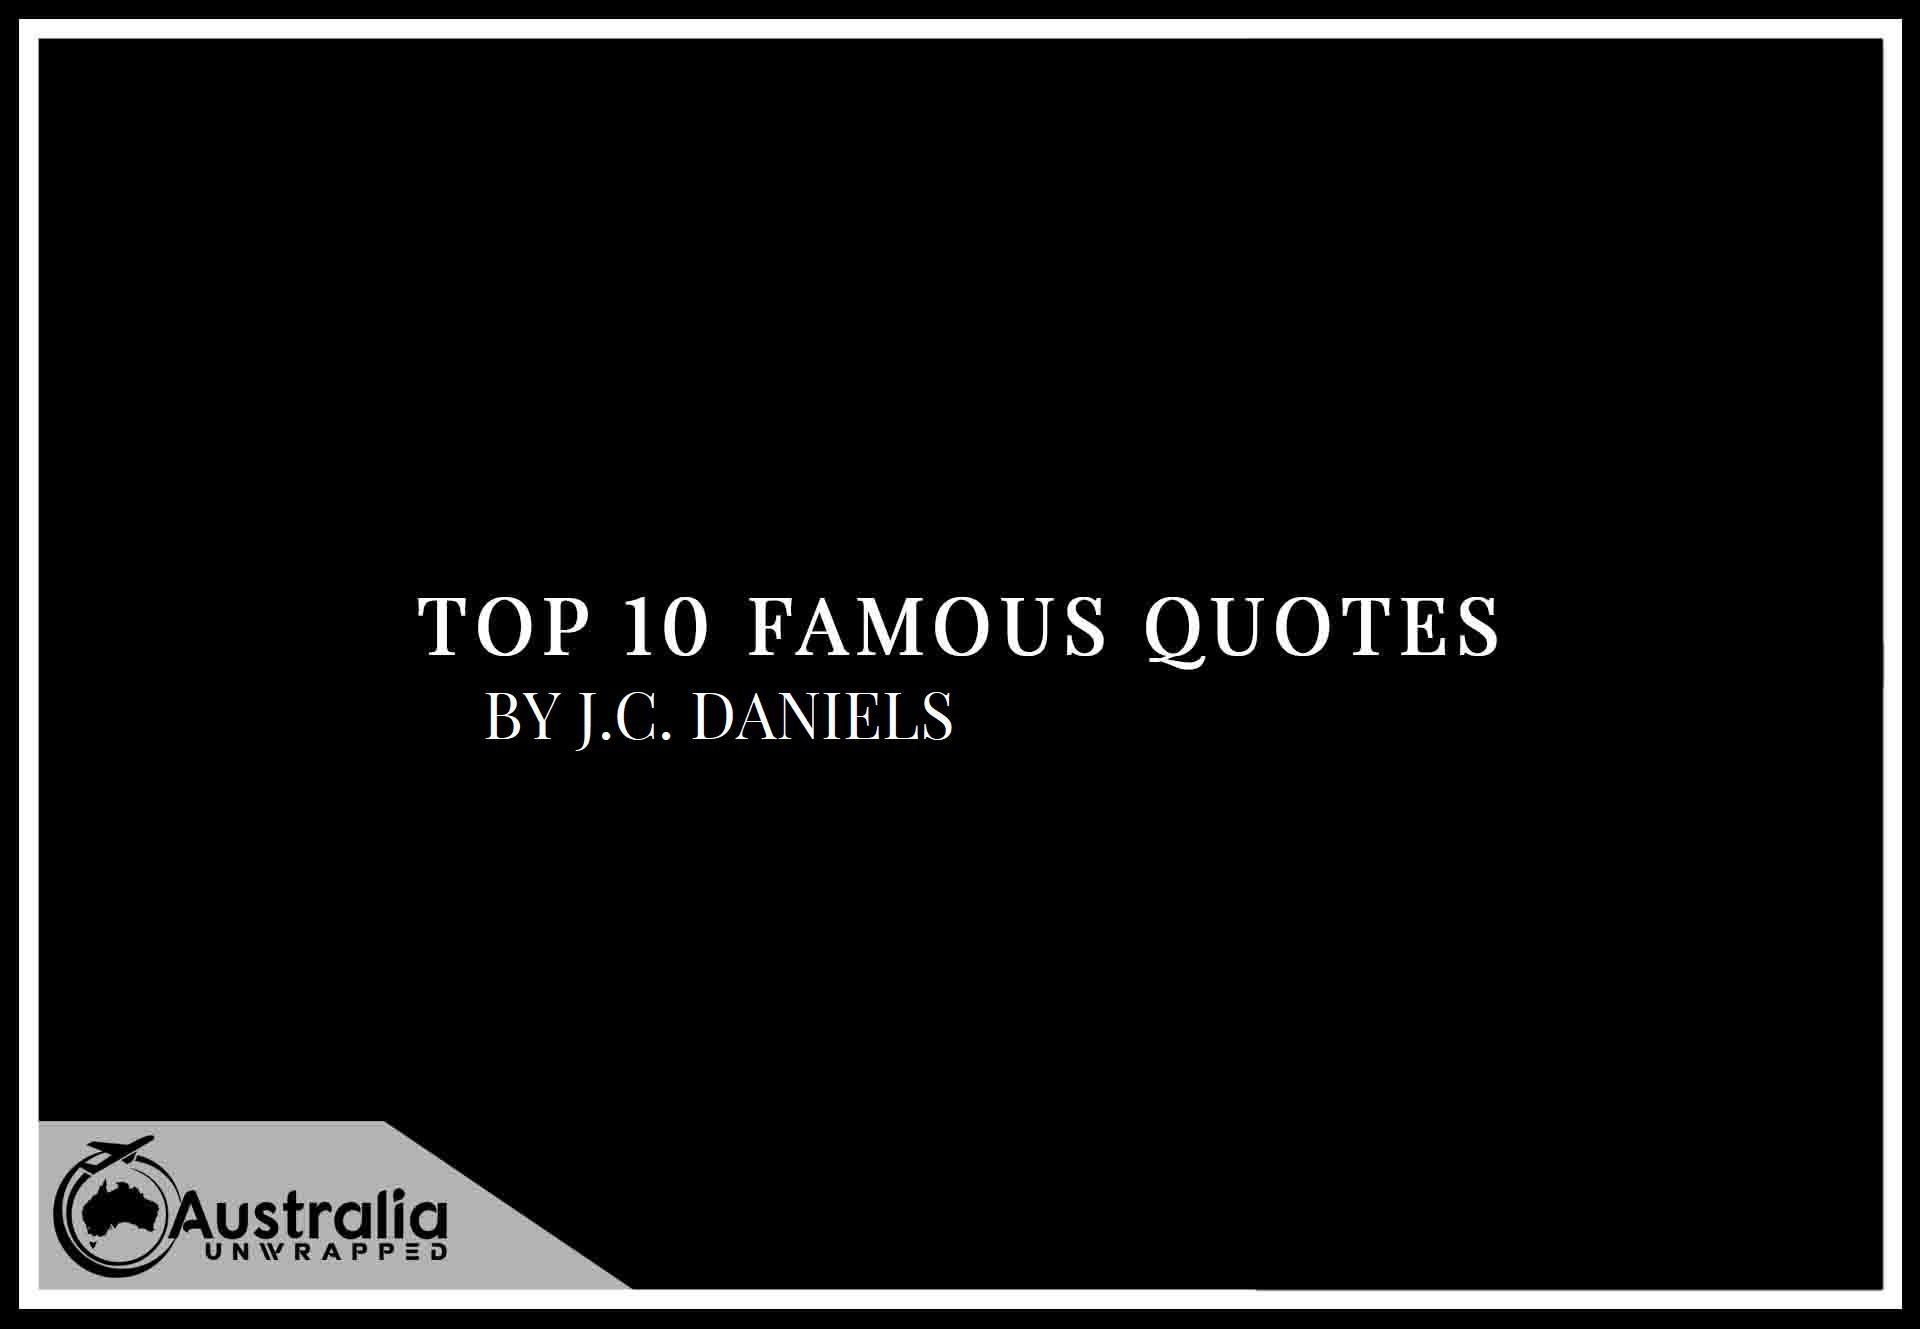 Top 10 Famous Quotes by Author J.C. Daniels